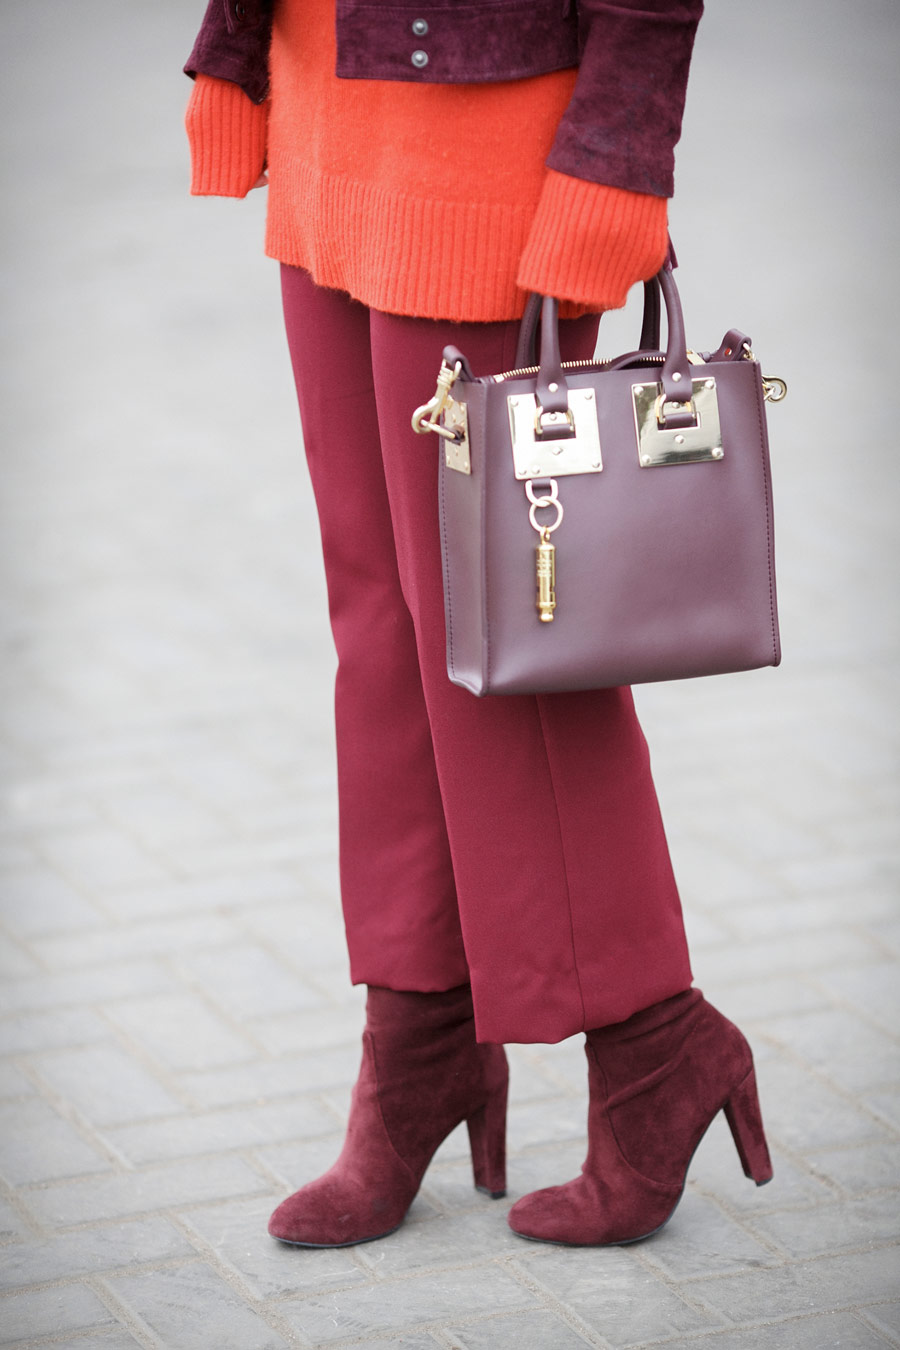 sophie hulme outfits, burgundy street styles